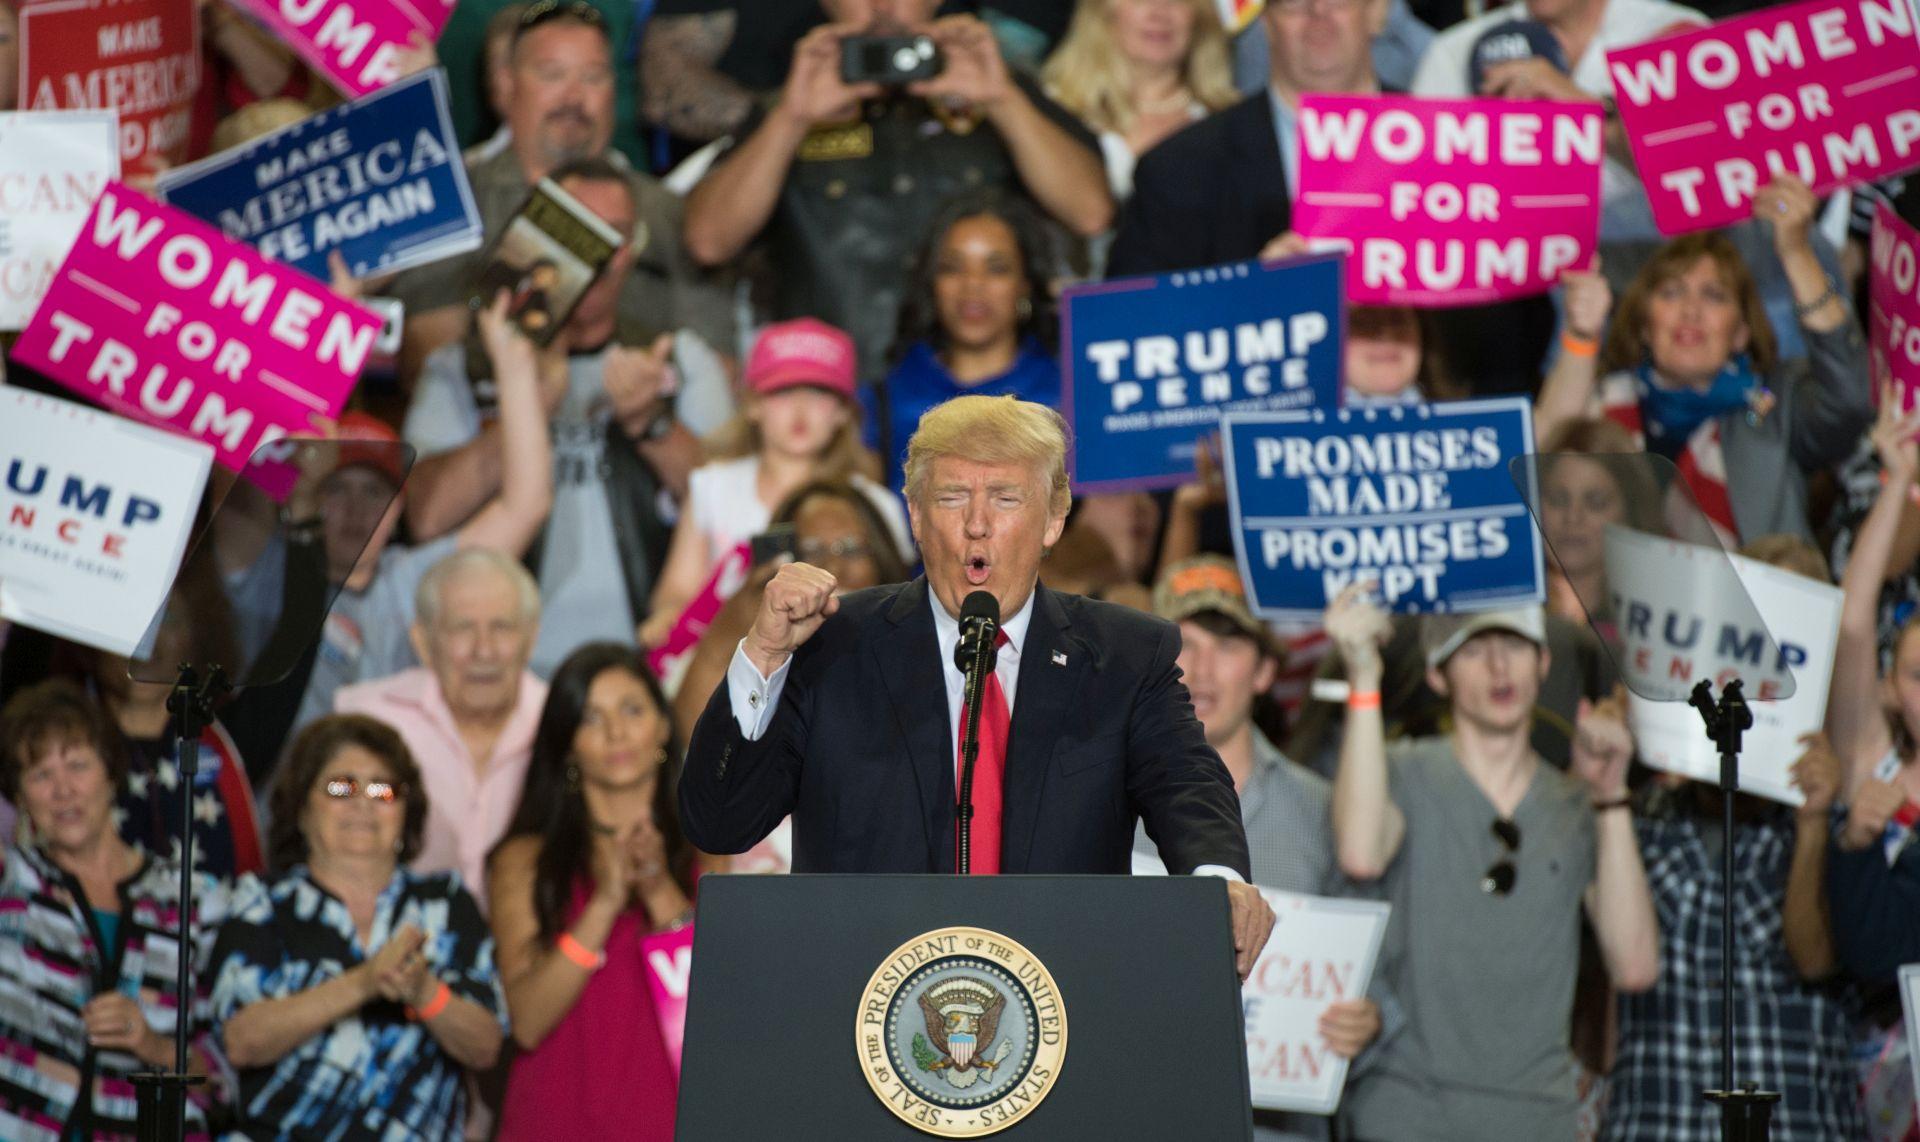 Trump obilježavanje svojih 100 dana počeo napadom na medije